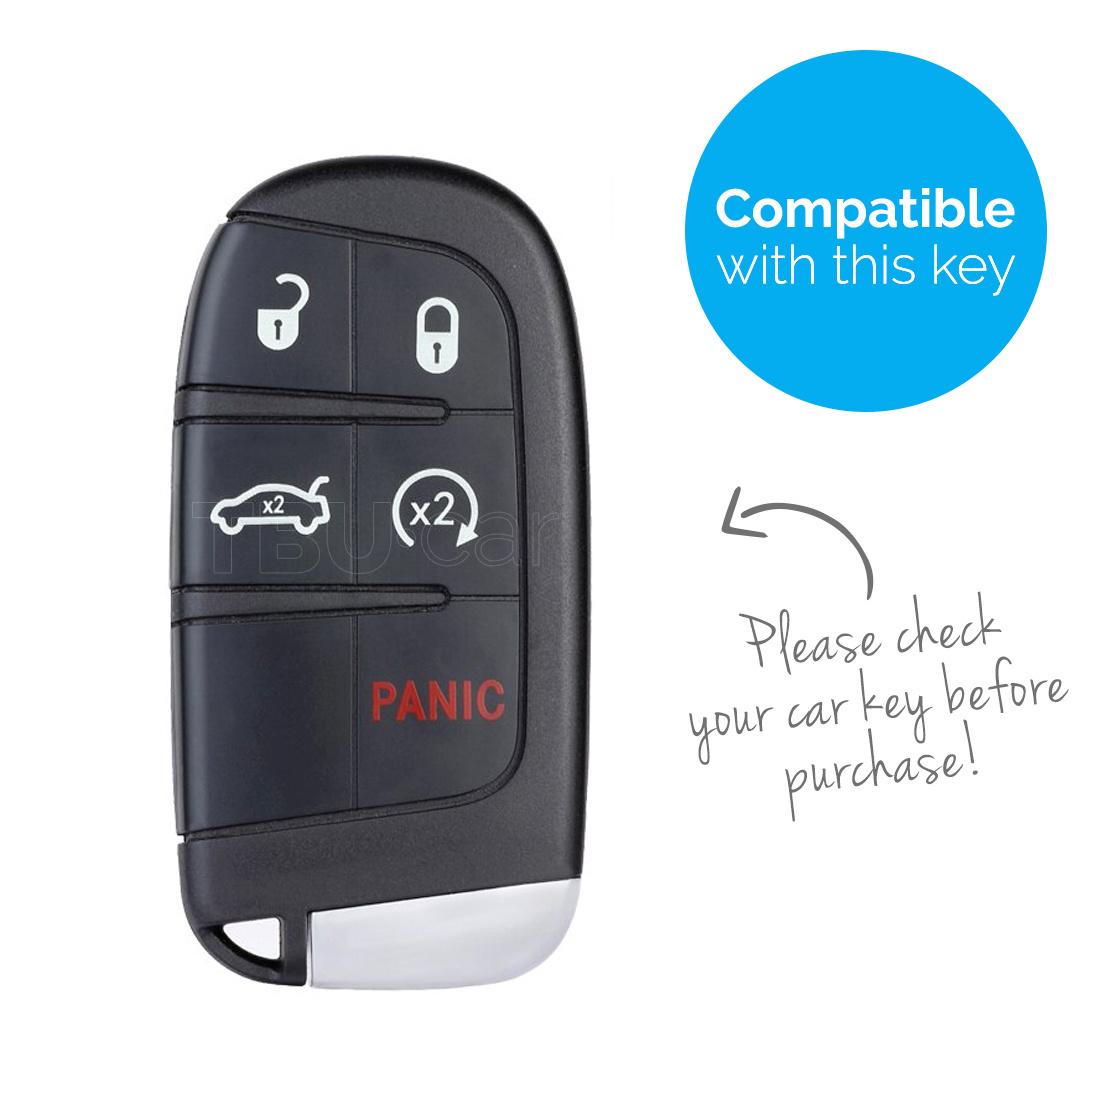 TBU car TBU car Autoschlüssel Hülle kompatibel mit Fiat 5 Tasten (Keyless Entry) - Schutzhülle aus Silikon - Auto Schlüsselhülle Cover in Im Dunkeln leuchten